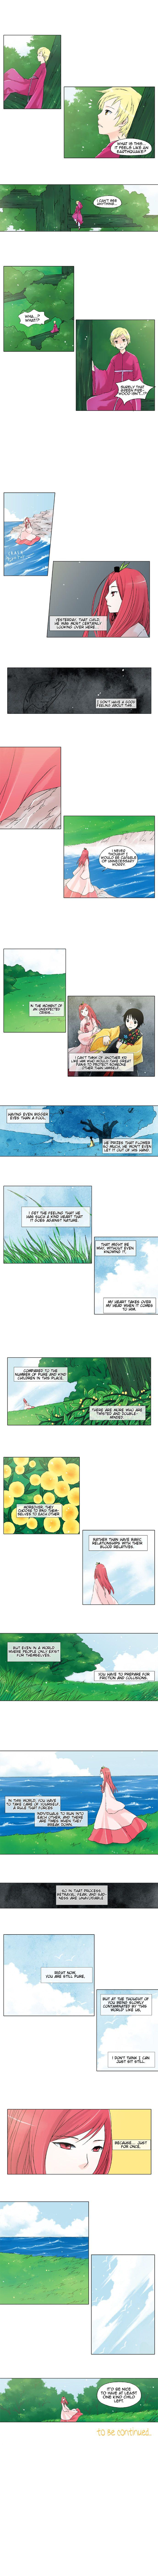 Star's Last Wish 7 Page 3